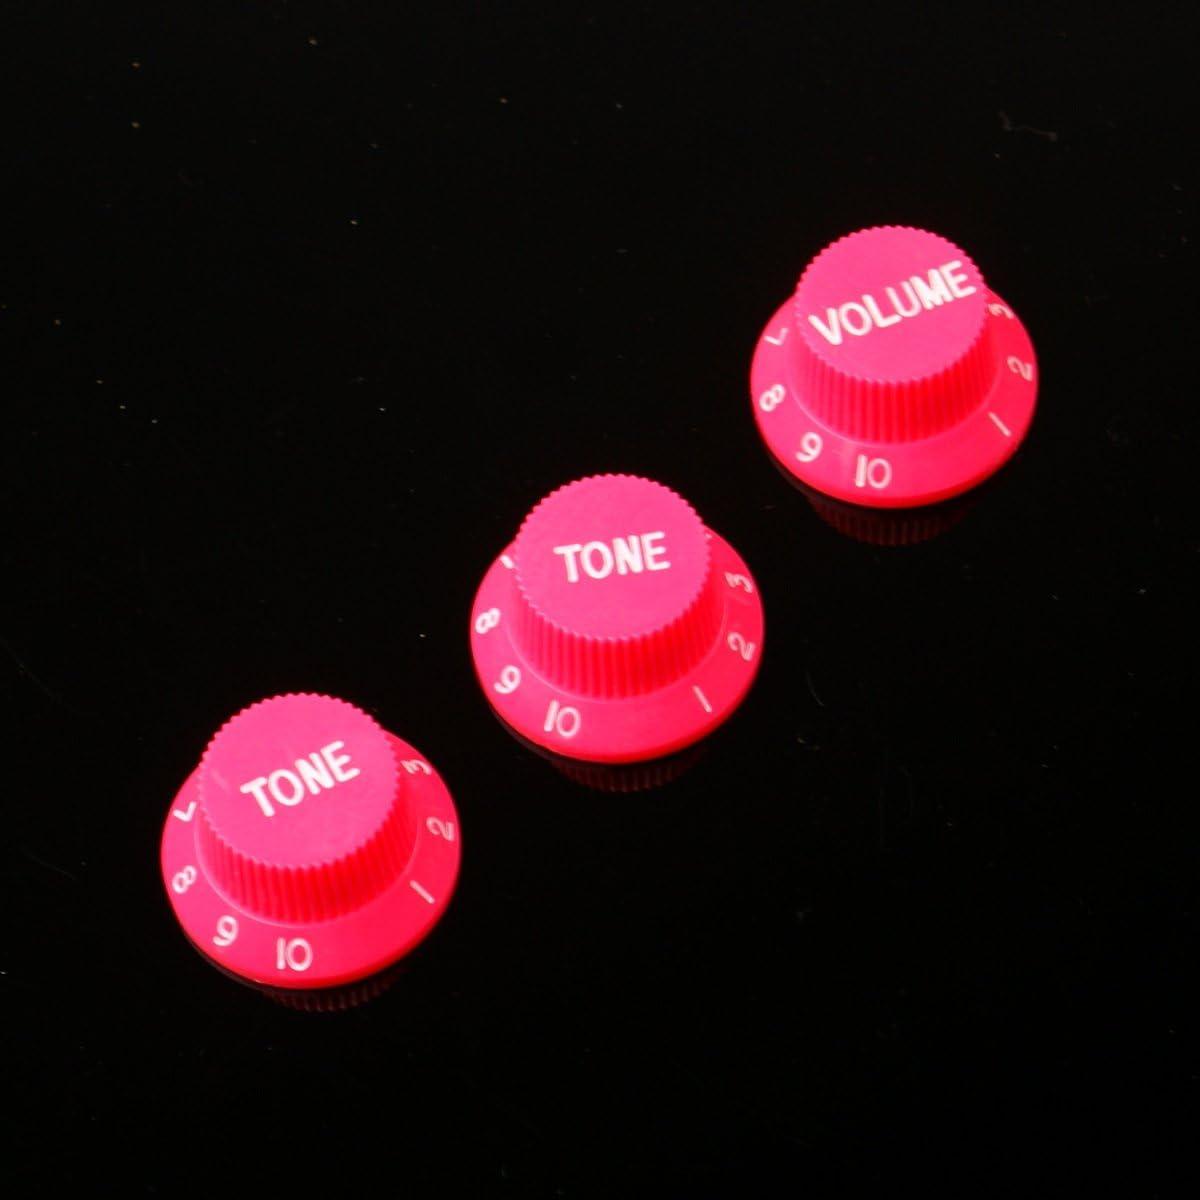 Strat style Guitar Control knobs Set 2 Tones, 1 Volume ,Orange